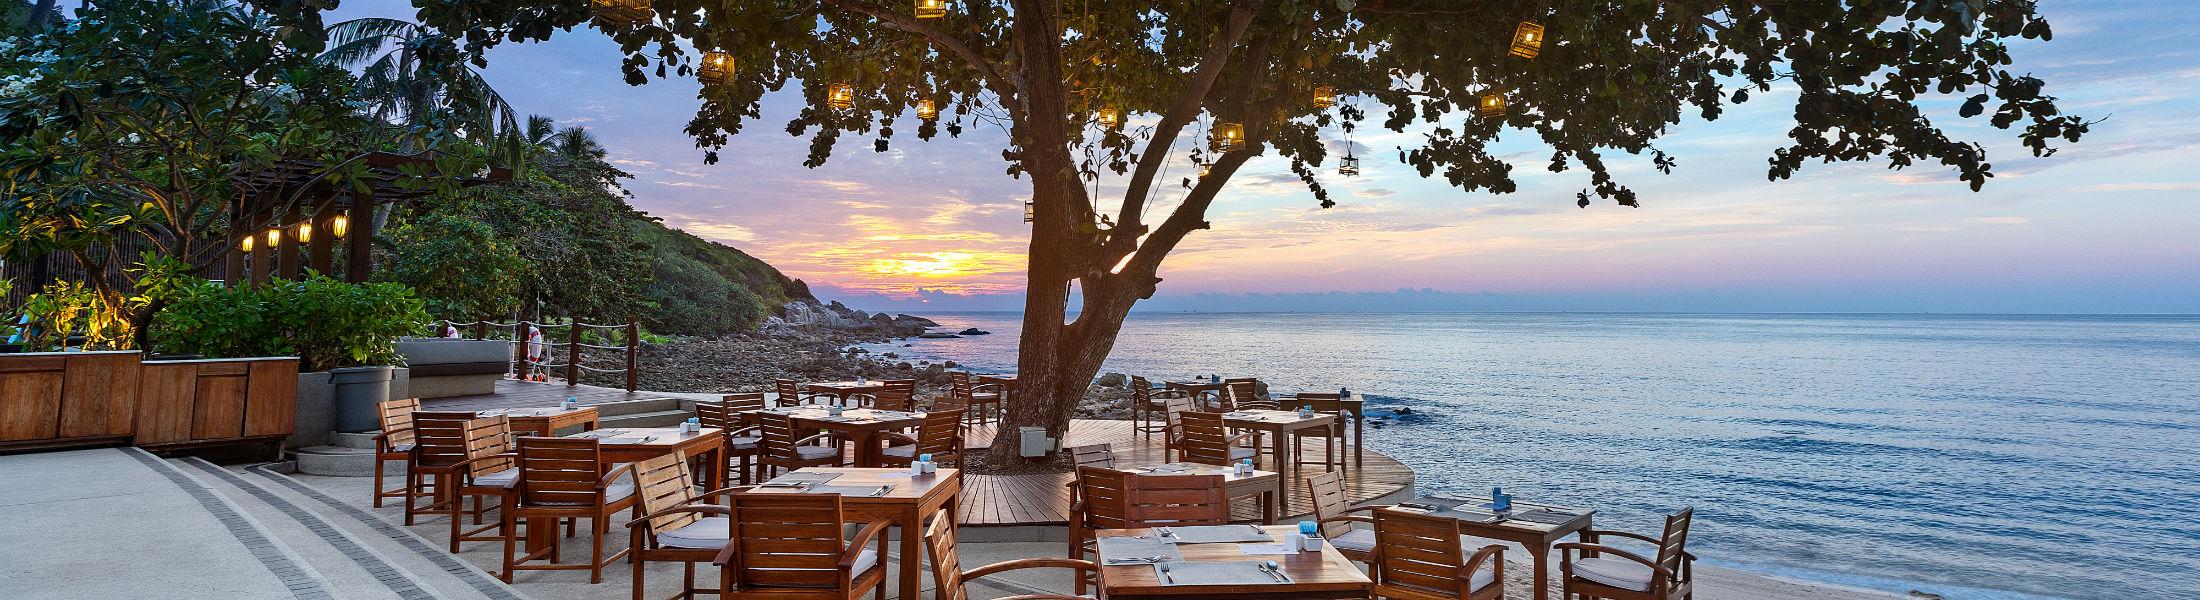 Outdoor dining at sunset at Outrigger Koh Samui Beach Resort